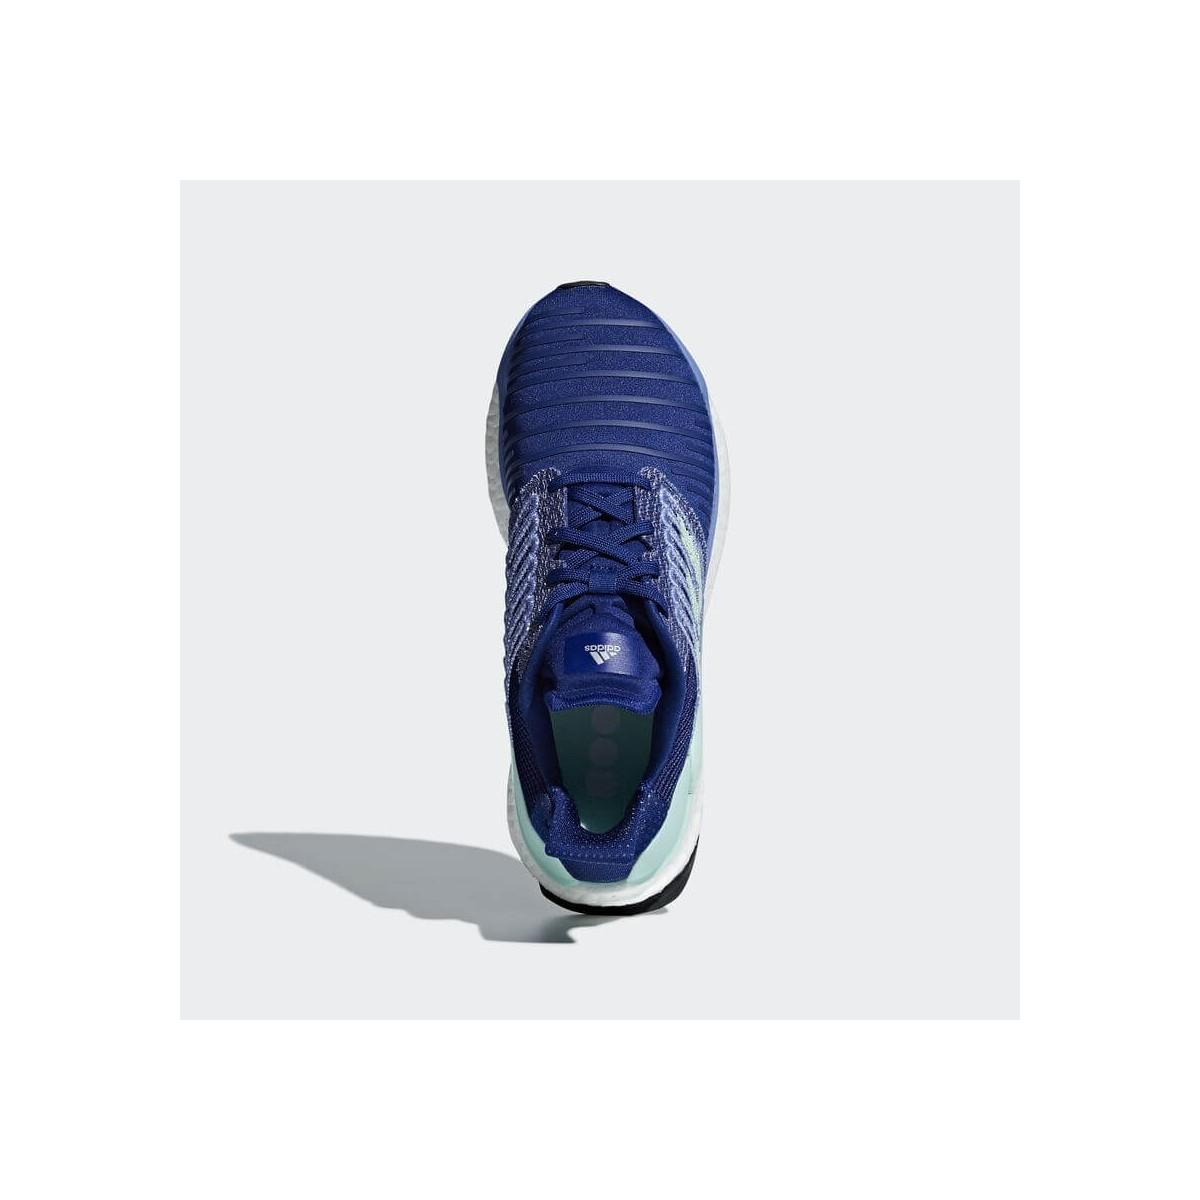 on sale 9cb27 8b171 ... Zapatillas Adidas Solar Boost Azul Mujer OI18 ...